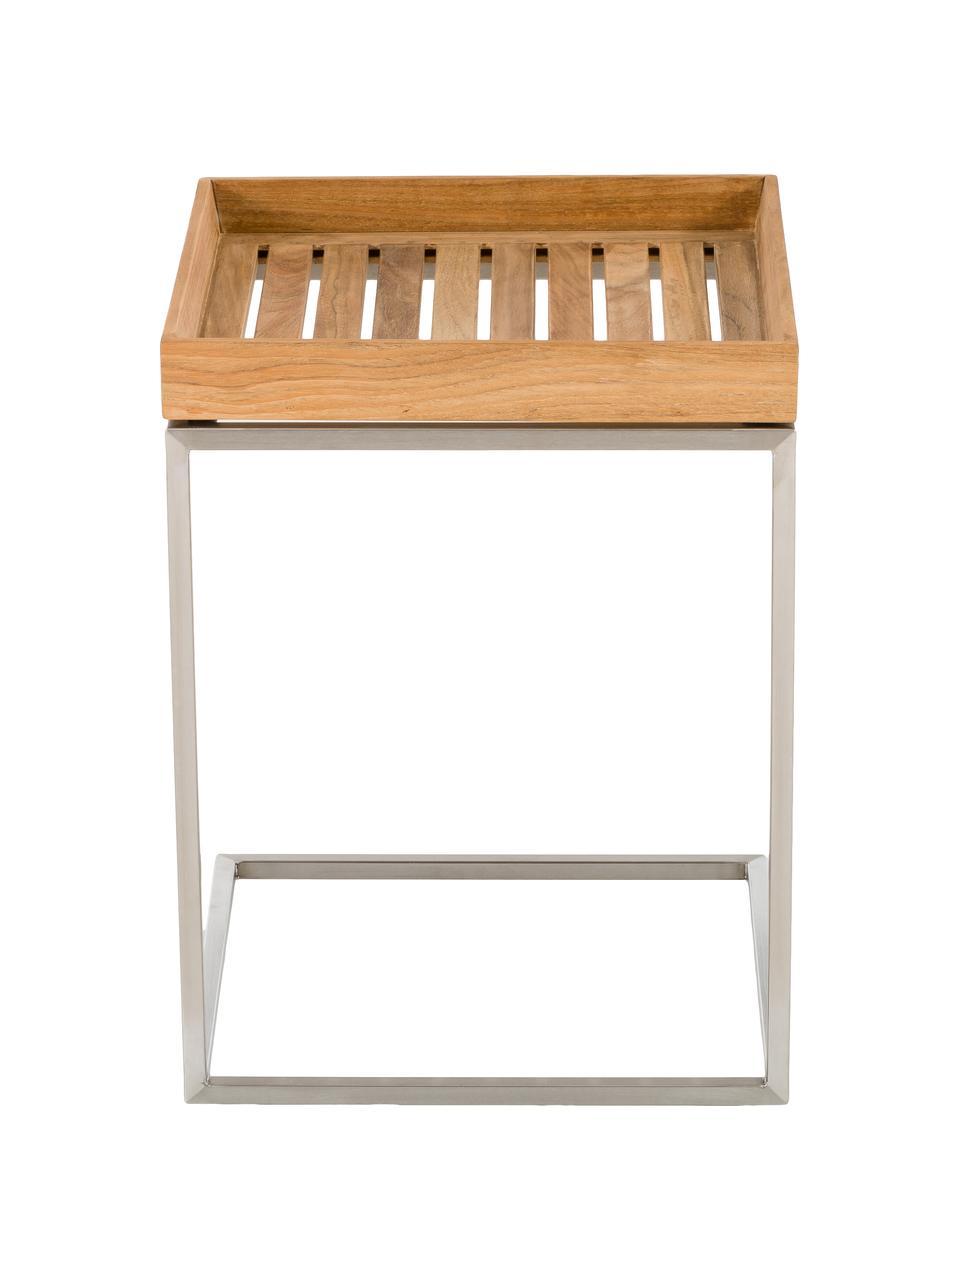 Balkon-Tablettisch Pizzo mit Teakholzplatte, Tischplatte: Massives Teakholz, geölt, Gestell: Edelstahl, geschliffen, Teakholz, Edelstahl, 40 x 52 cm